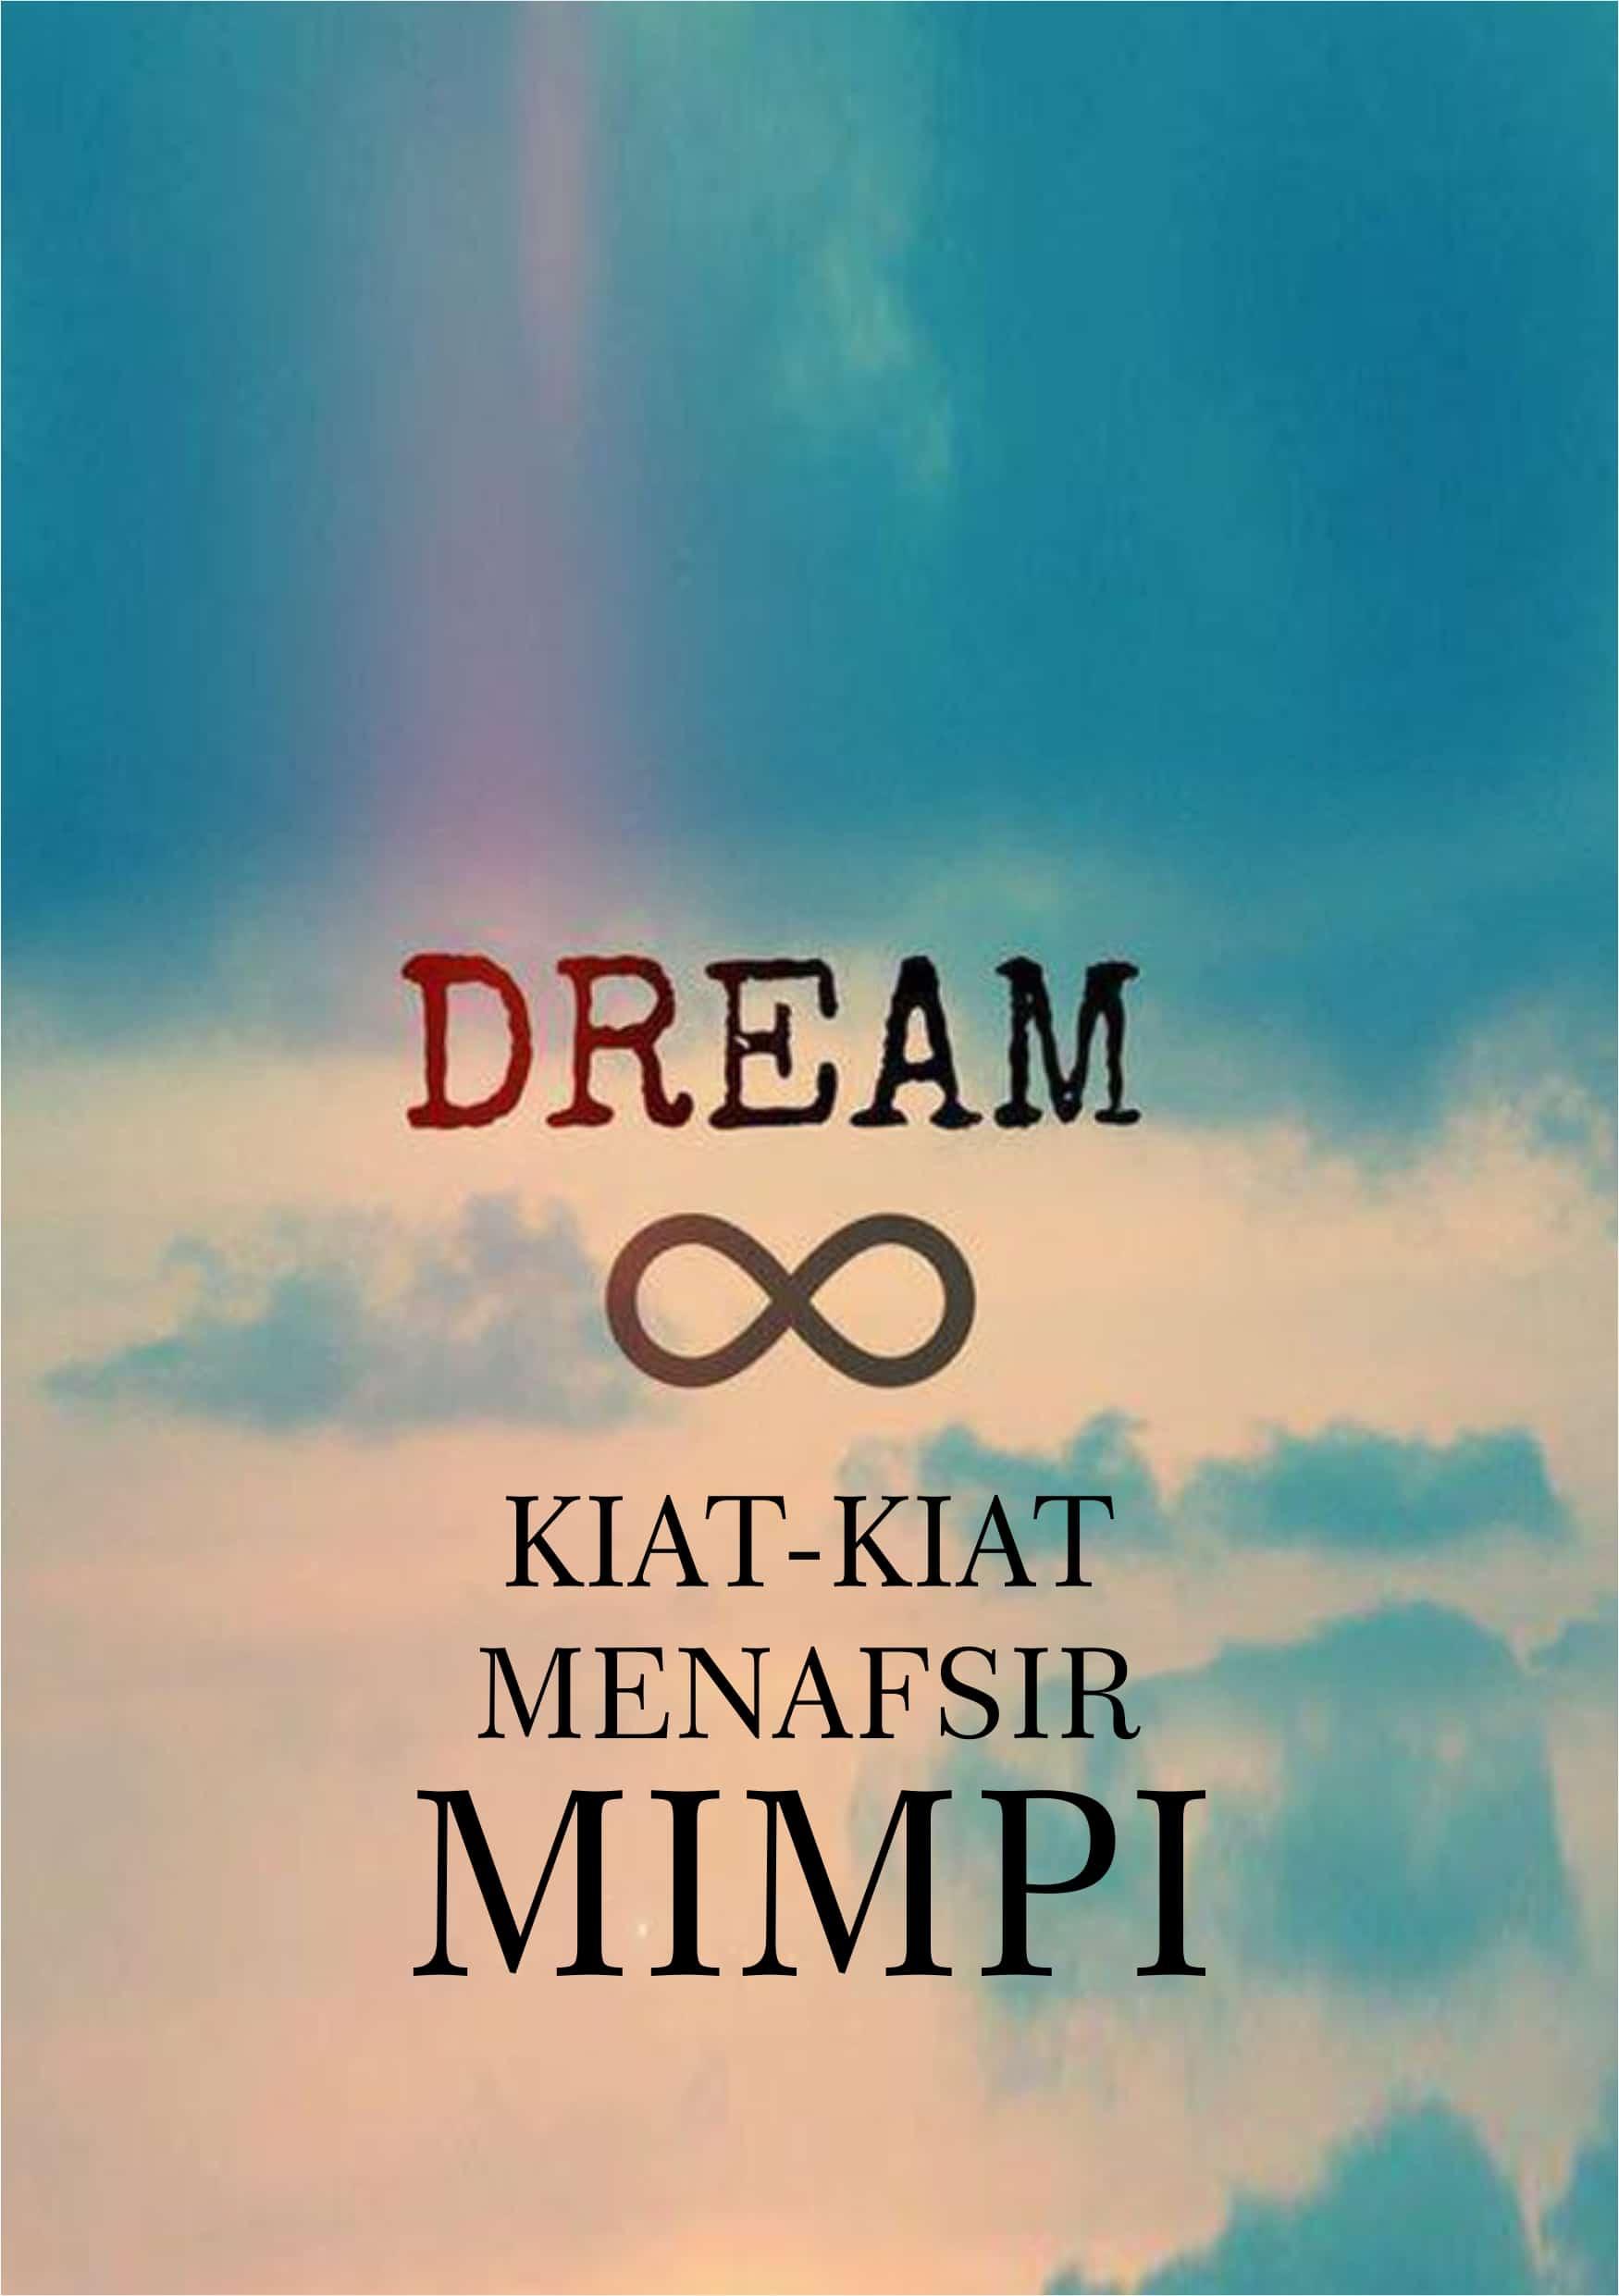 kiat-kiat menafsir mimpi - cara menafsir mimpi